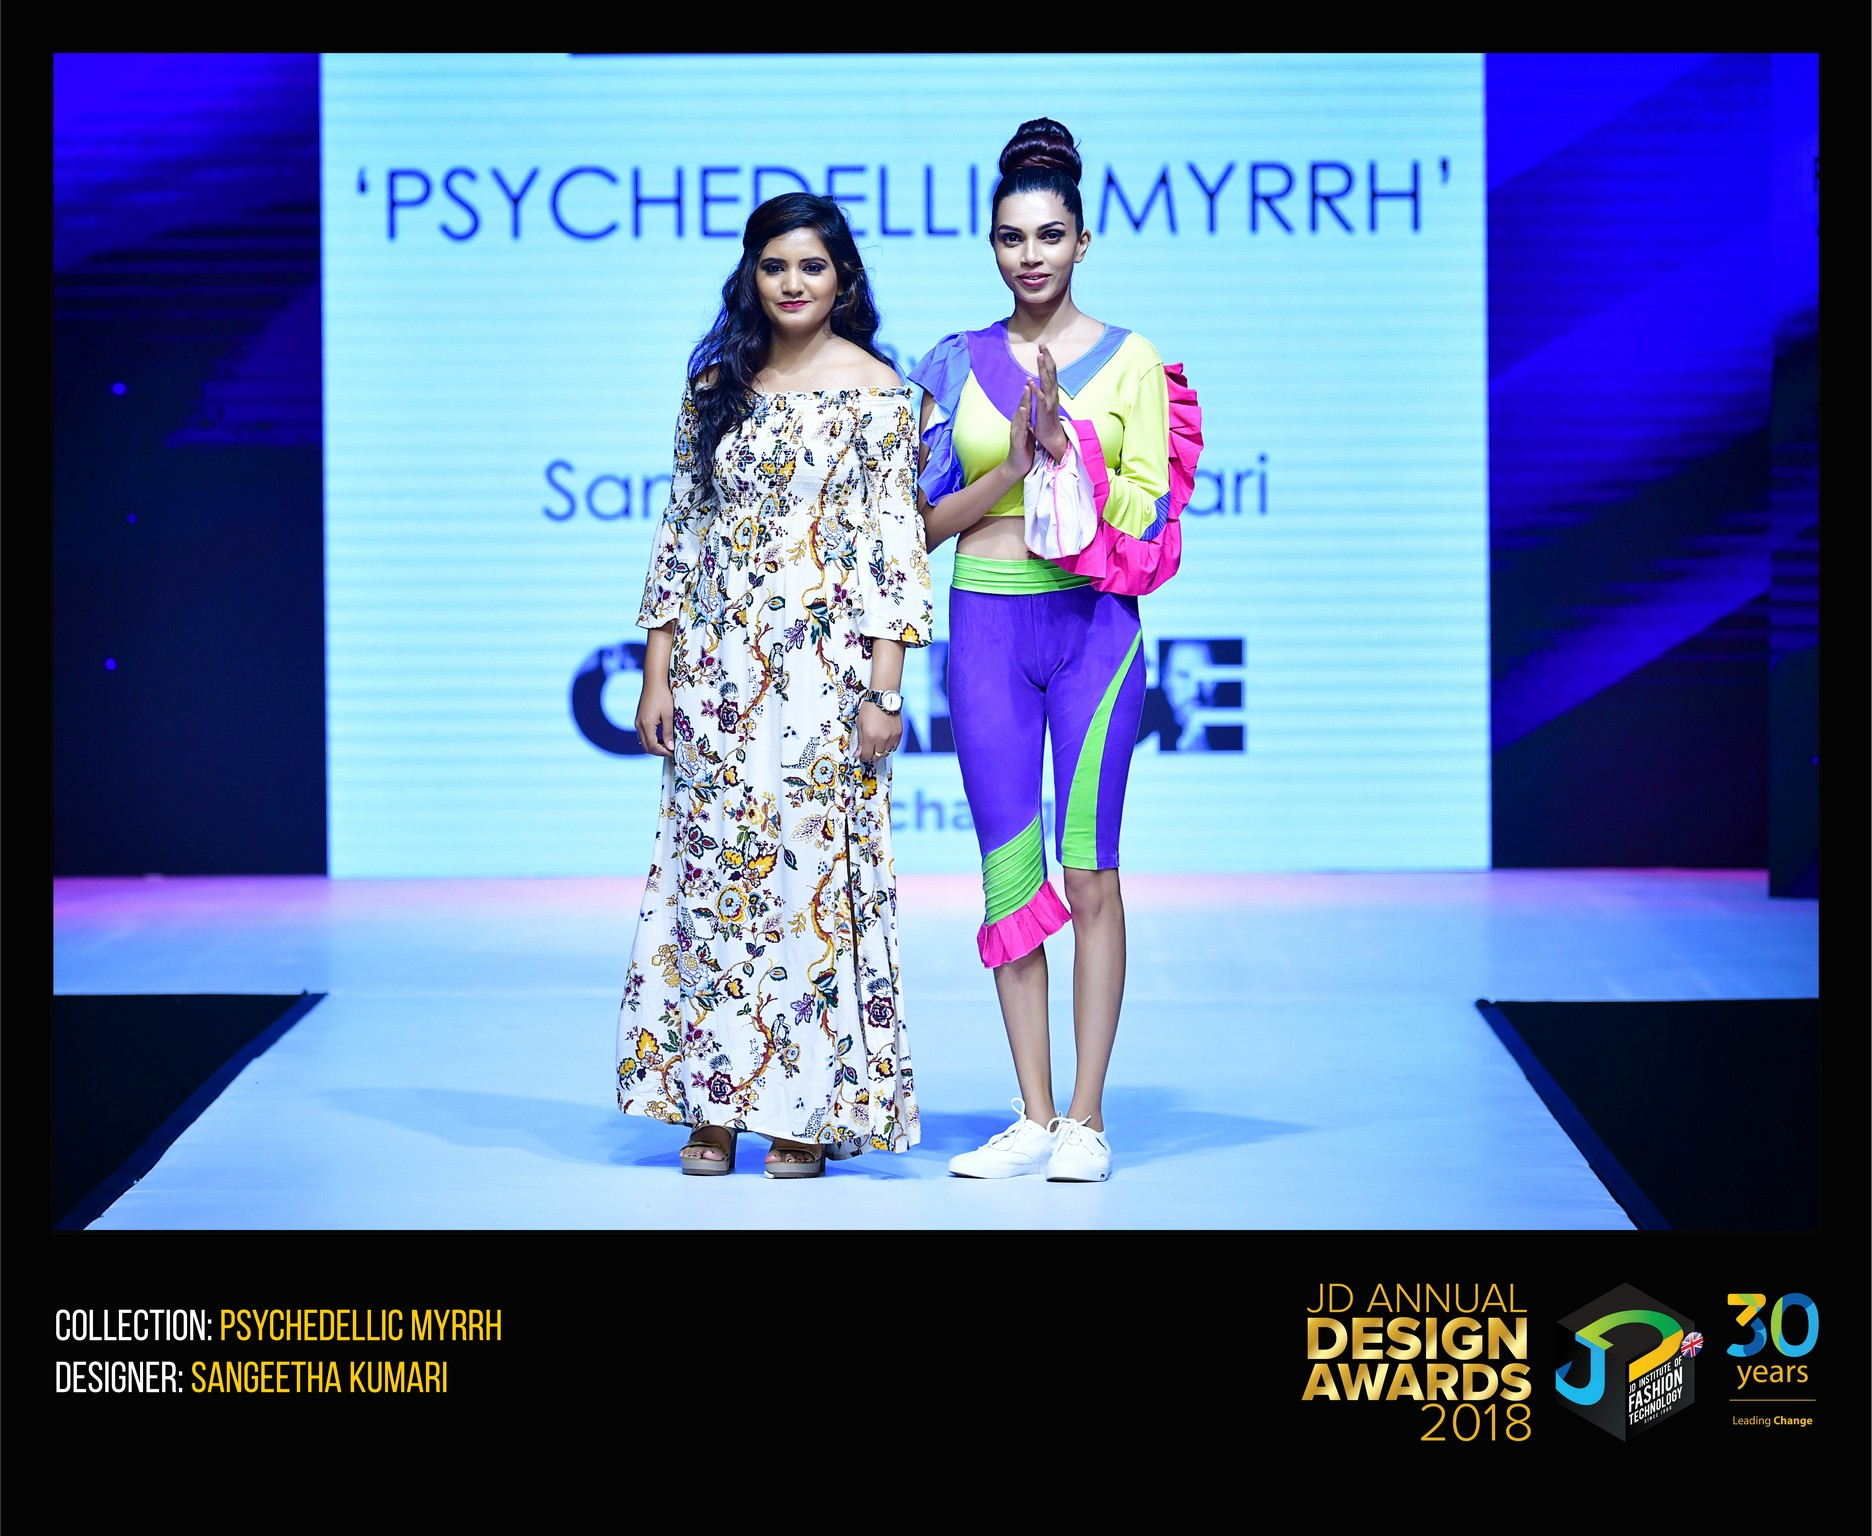 Psychedelic Myrrh – Change – JD Annual Design Awards 2018 | Designer: Sangeetha Kumari | Photography : Jerin Nath (@jerin_nath) psychedelic myrrh - PSYCHEDELLIC MYRRH10 final - Psychedelic Myrrh – Change – JD Annual Design Awards 2018